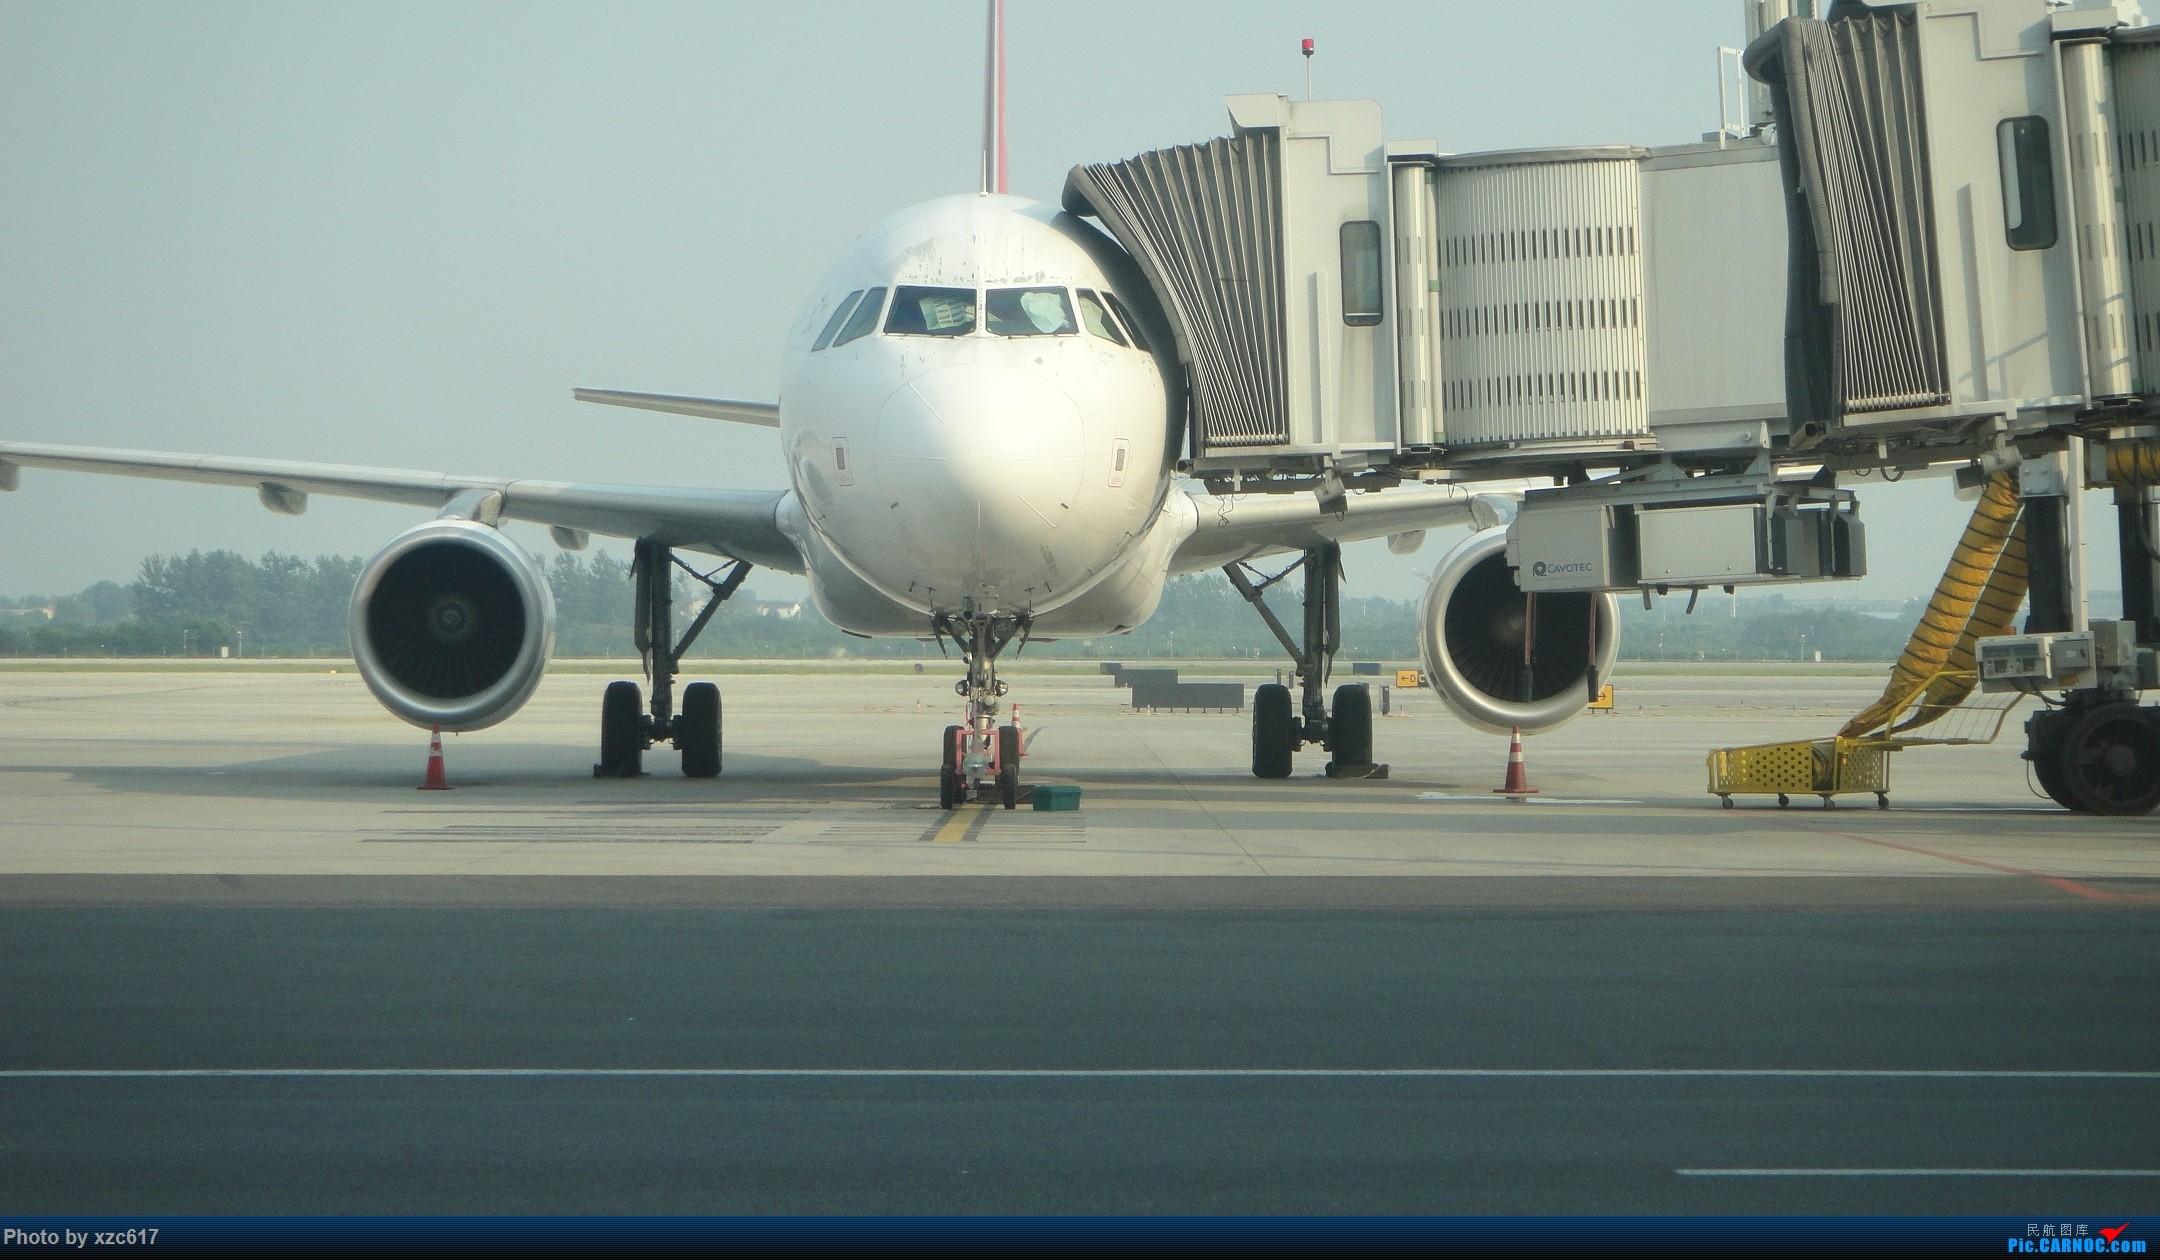 Re:[原创]xzc617的飞行游记 NO.1 由扬州到大连,平生第一次游海岛 AIRBUS A320-200  中国南京禄口国际机场